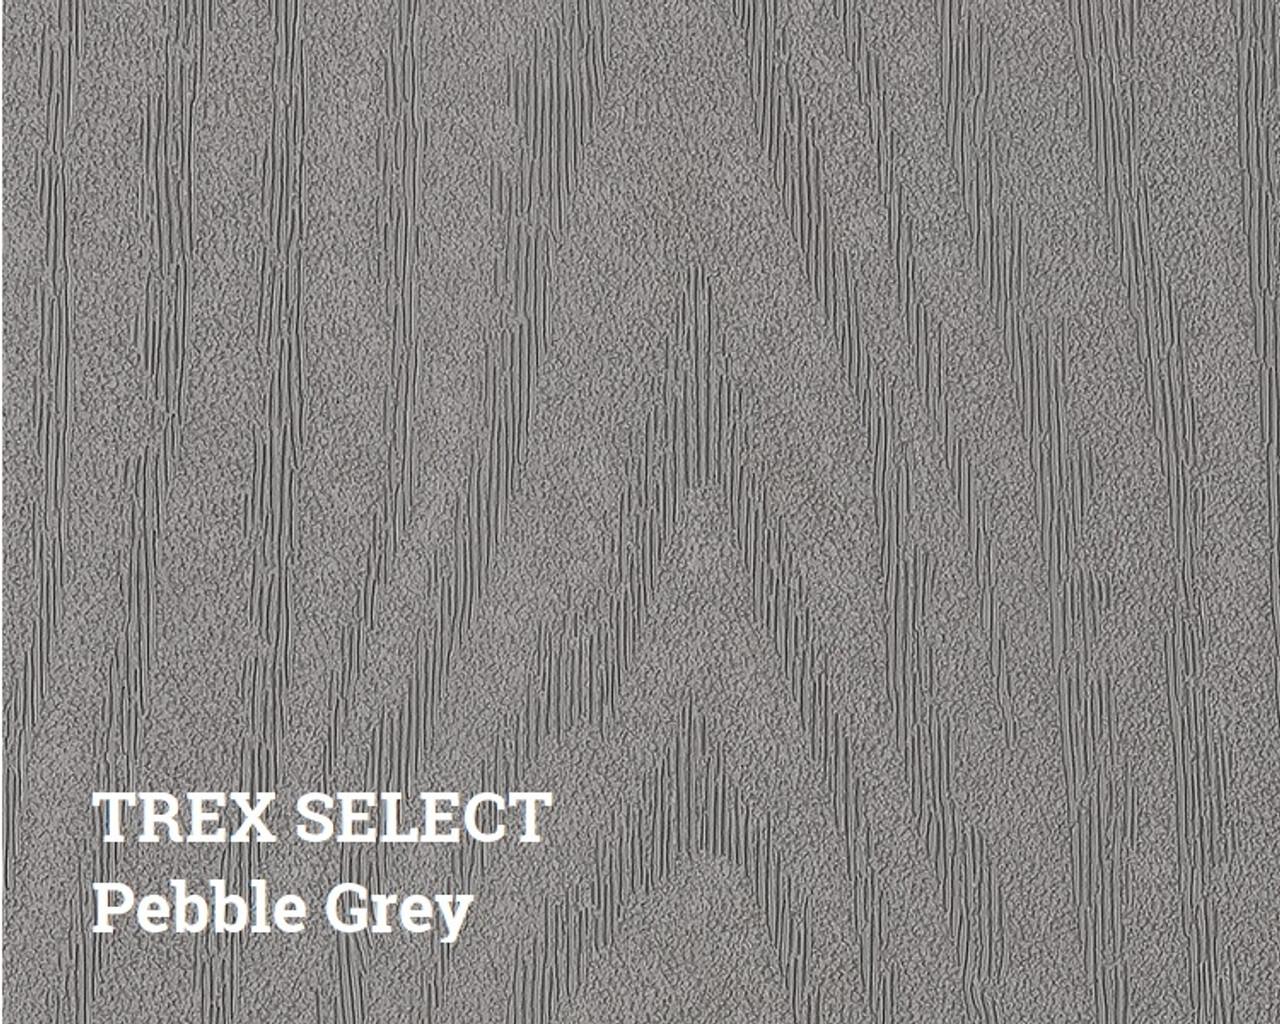 Trex Select Pebble Grey Decking Surface